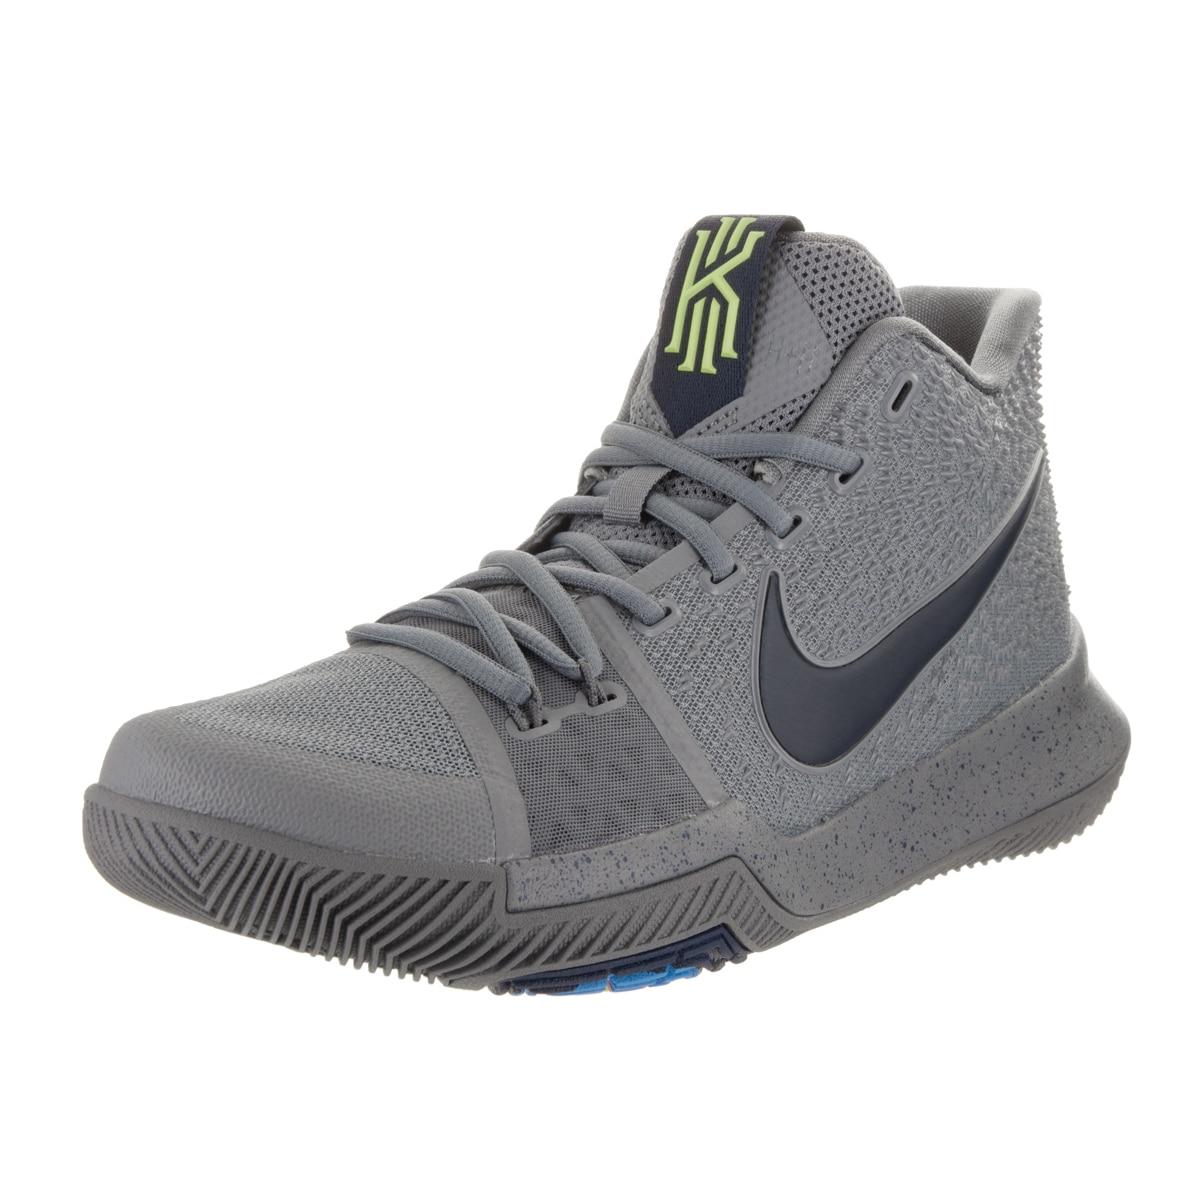 size 40 ad004 f37b9 Nike Men's Kyrie 3 Basketball Shoe